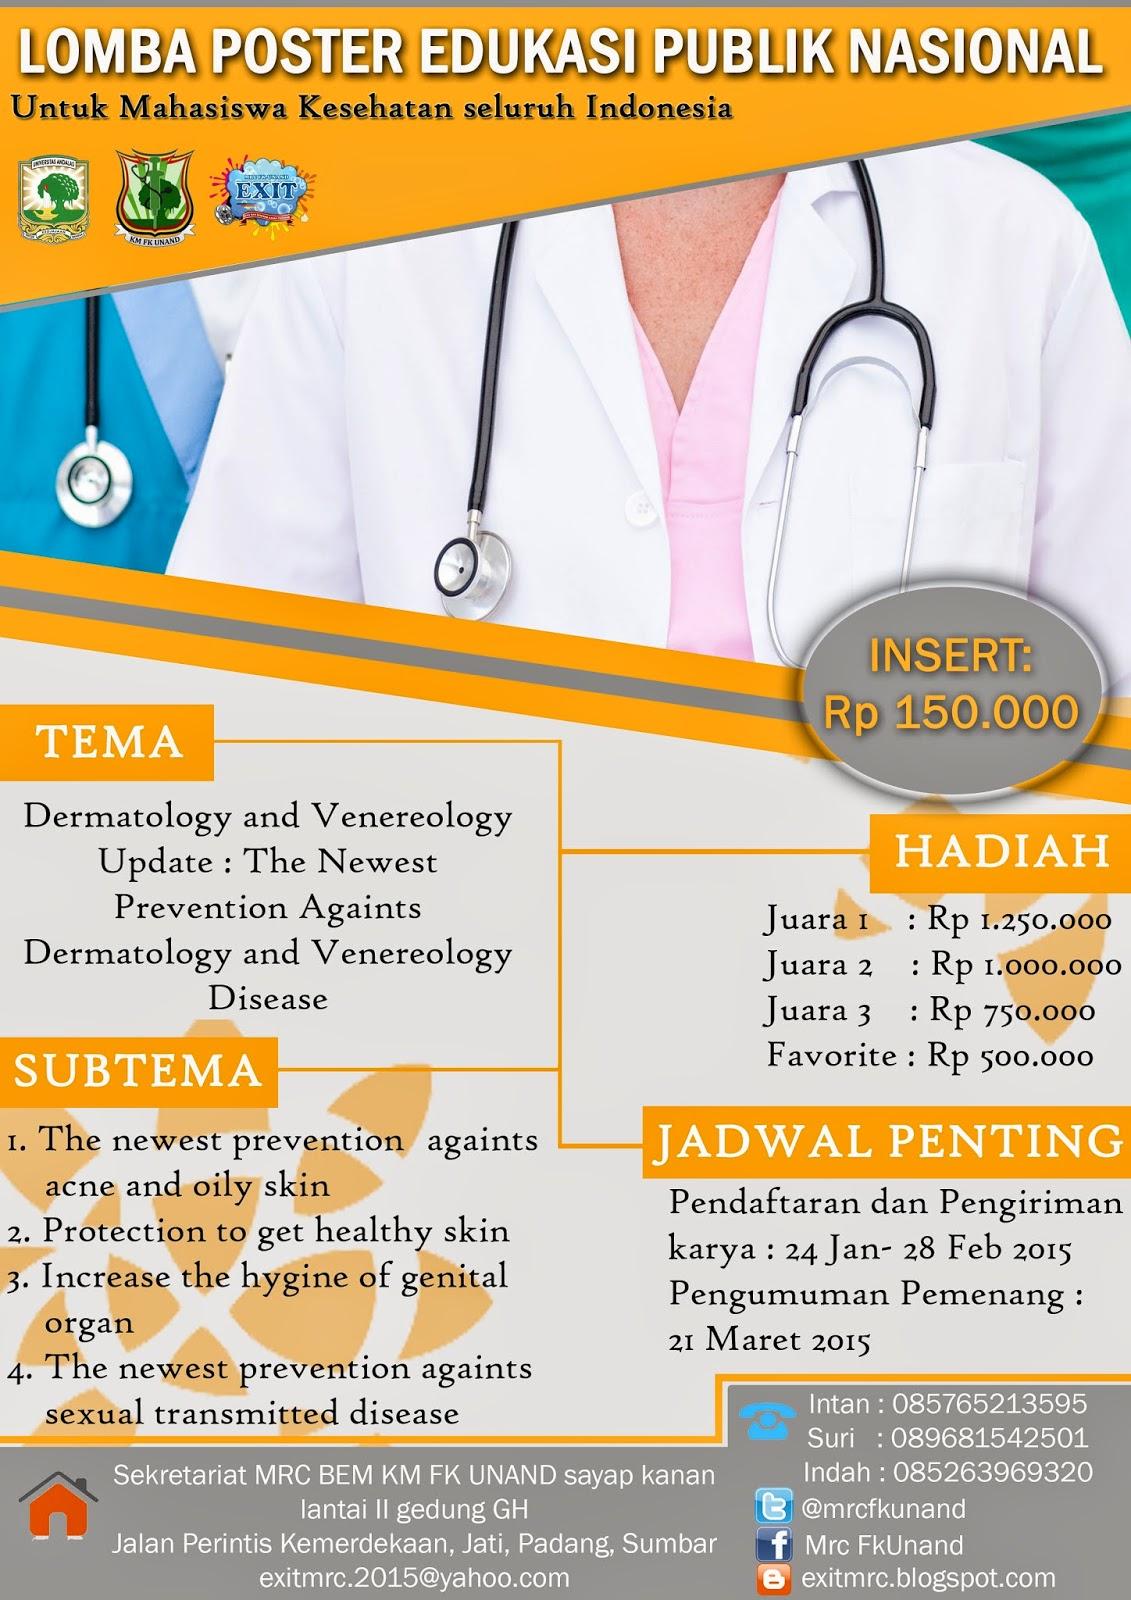 Lomba Gambar Poster Kesehatan